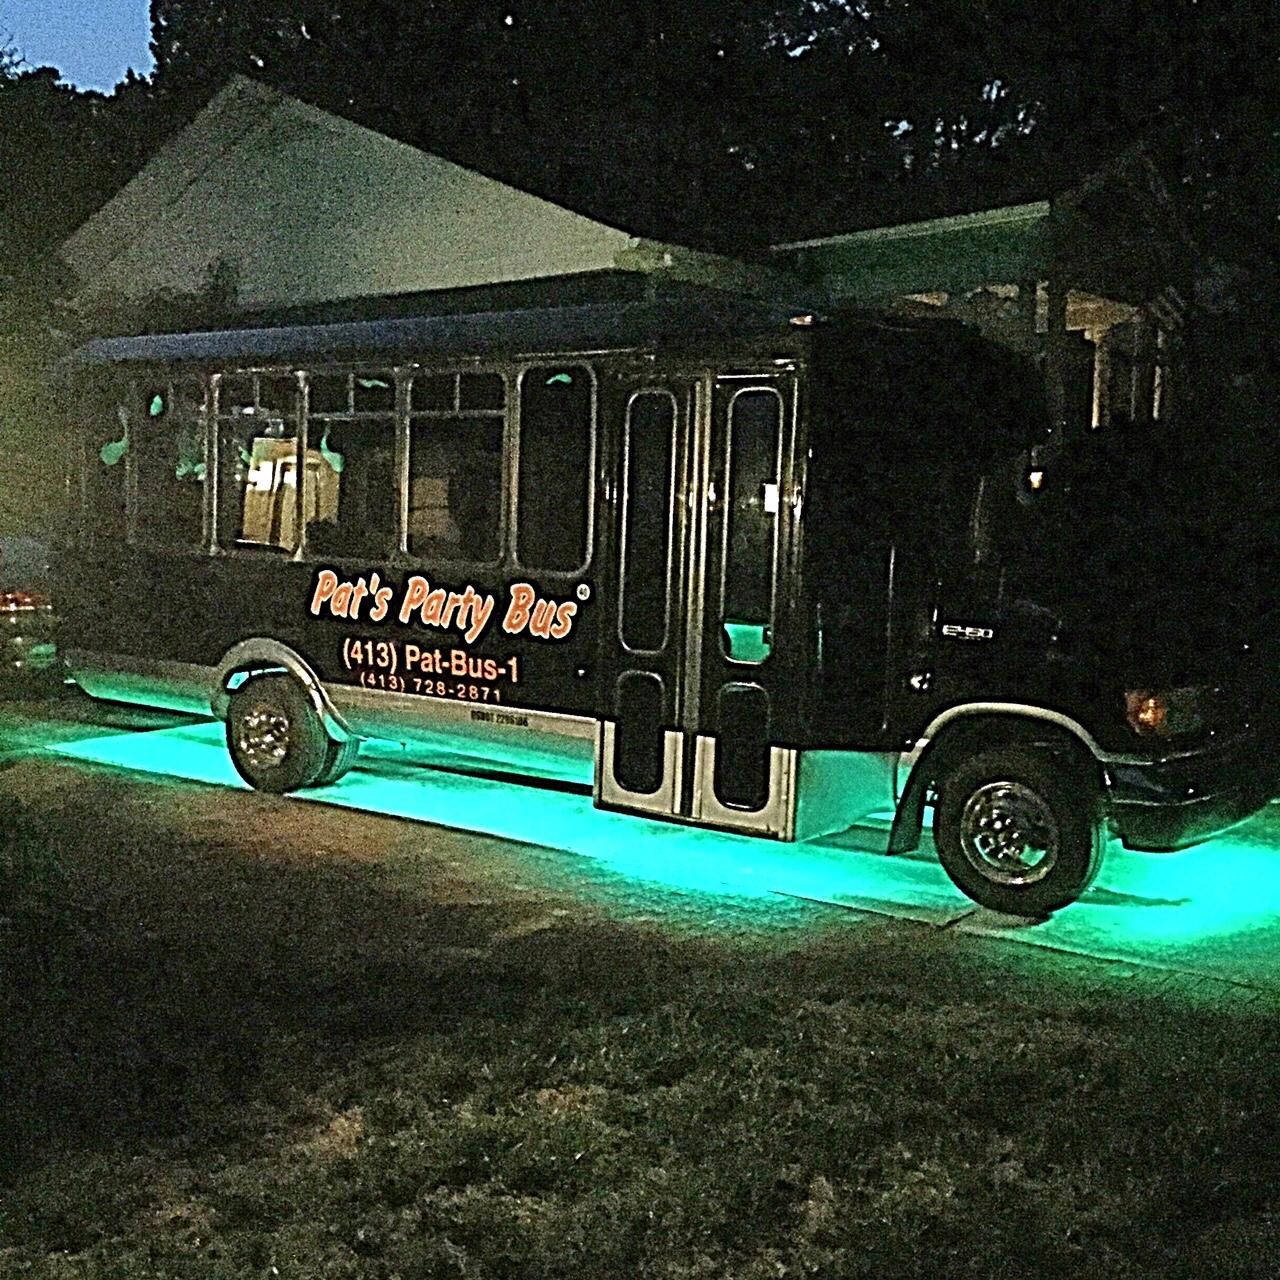 Party Bus 1.JPG